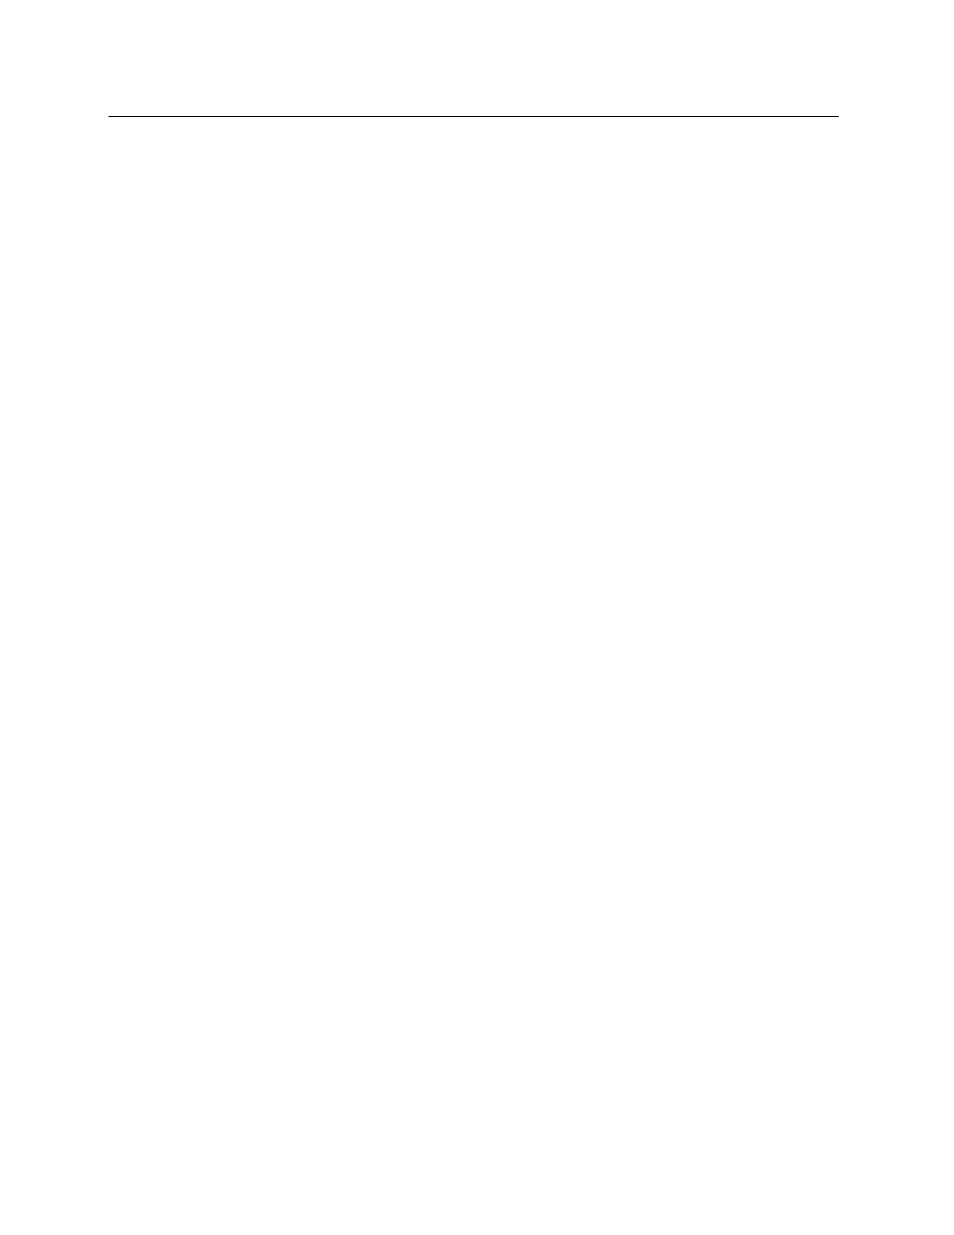 INFICON SQC-122 Thin Film Deposition Controller